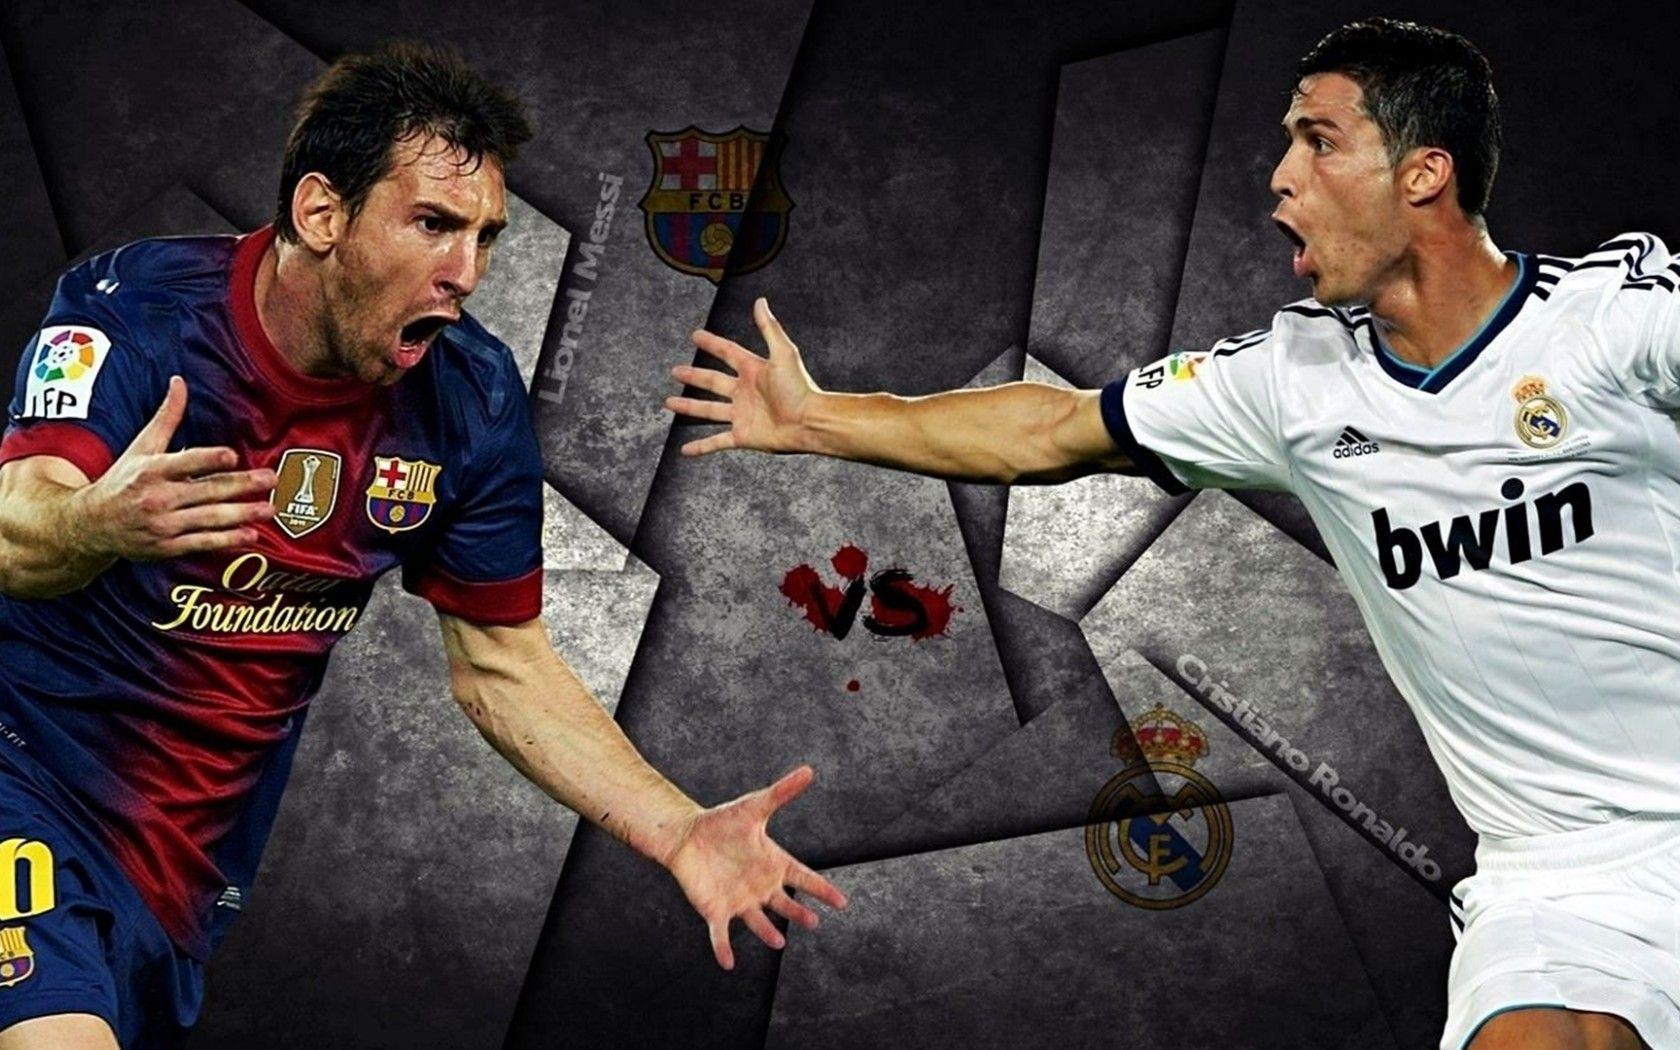 Messi Vs Ronaldo Wallpapers 1080p Messi Vs Ronaldo Messi Poster